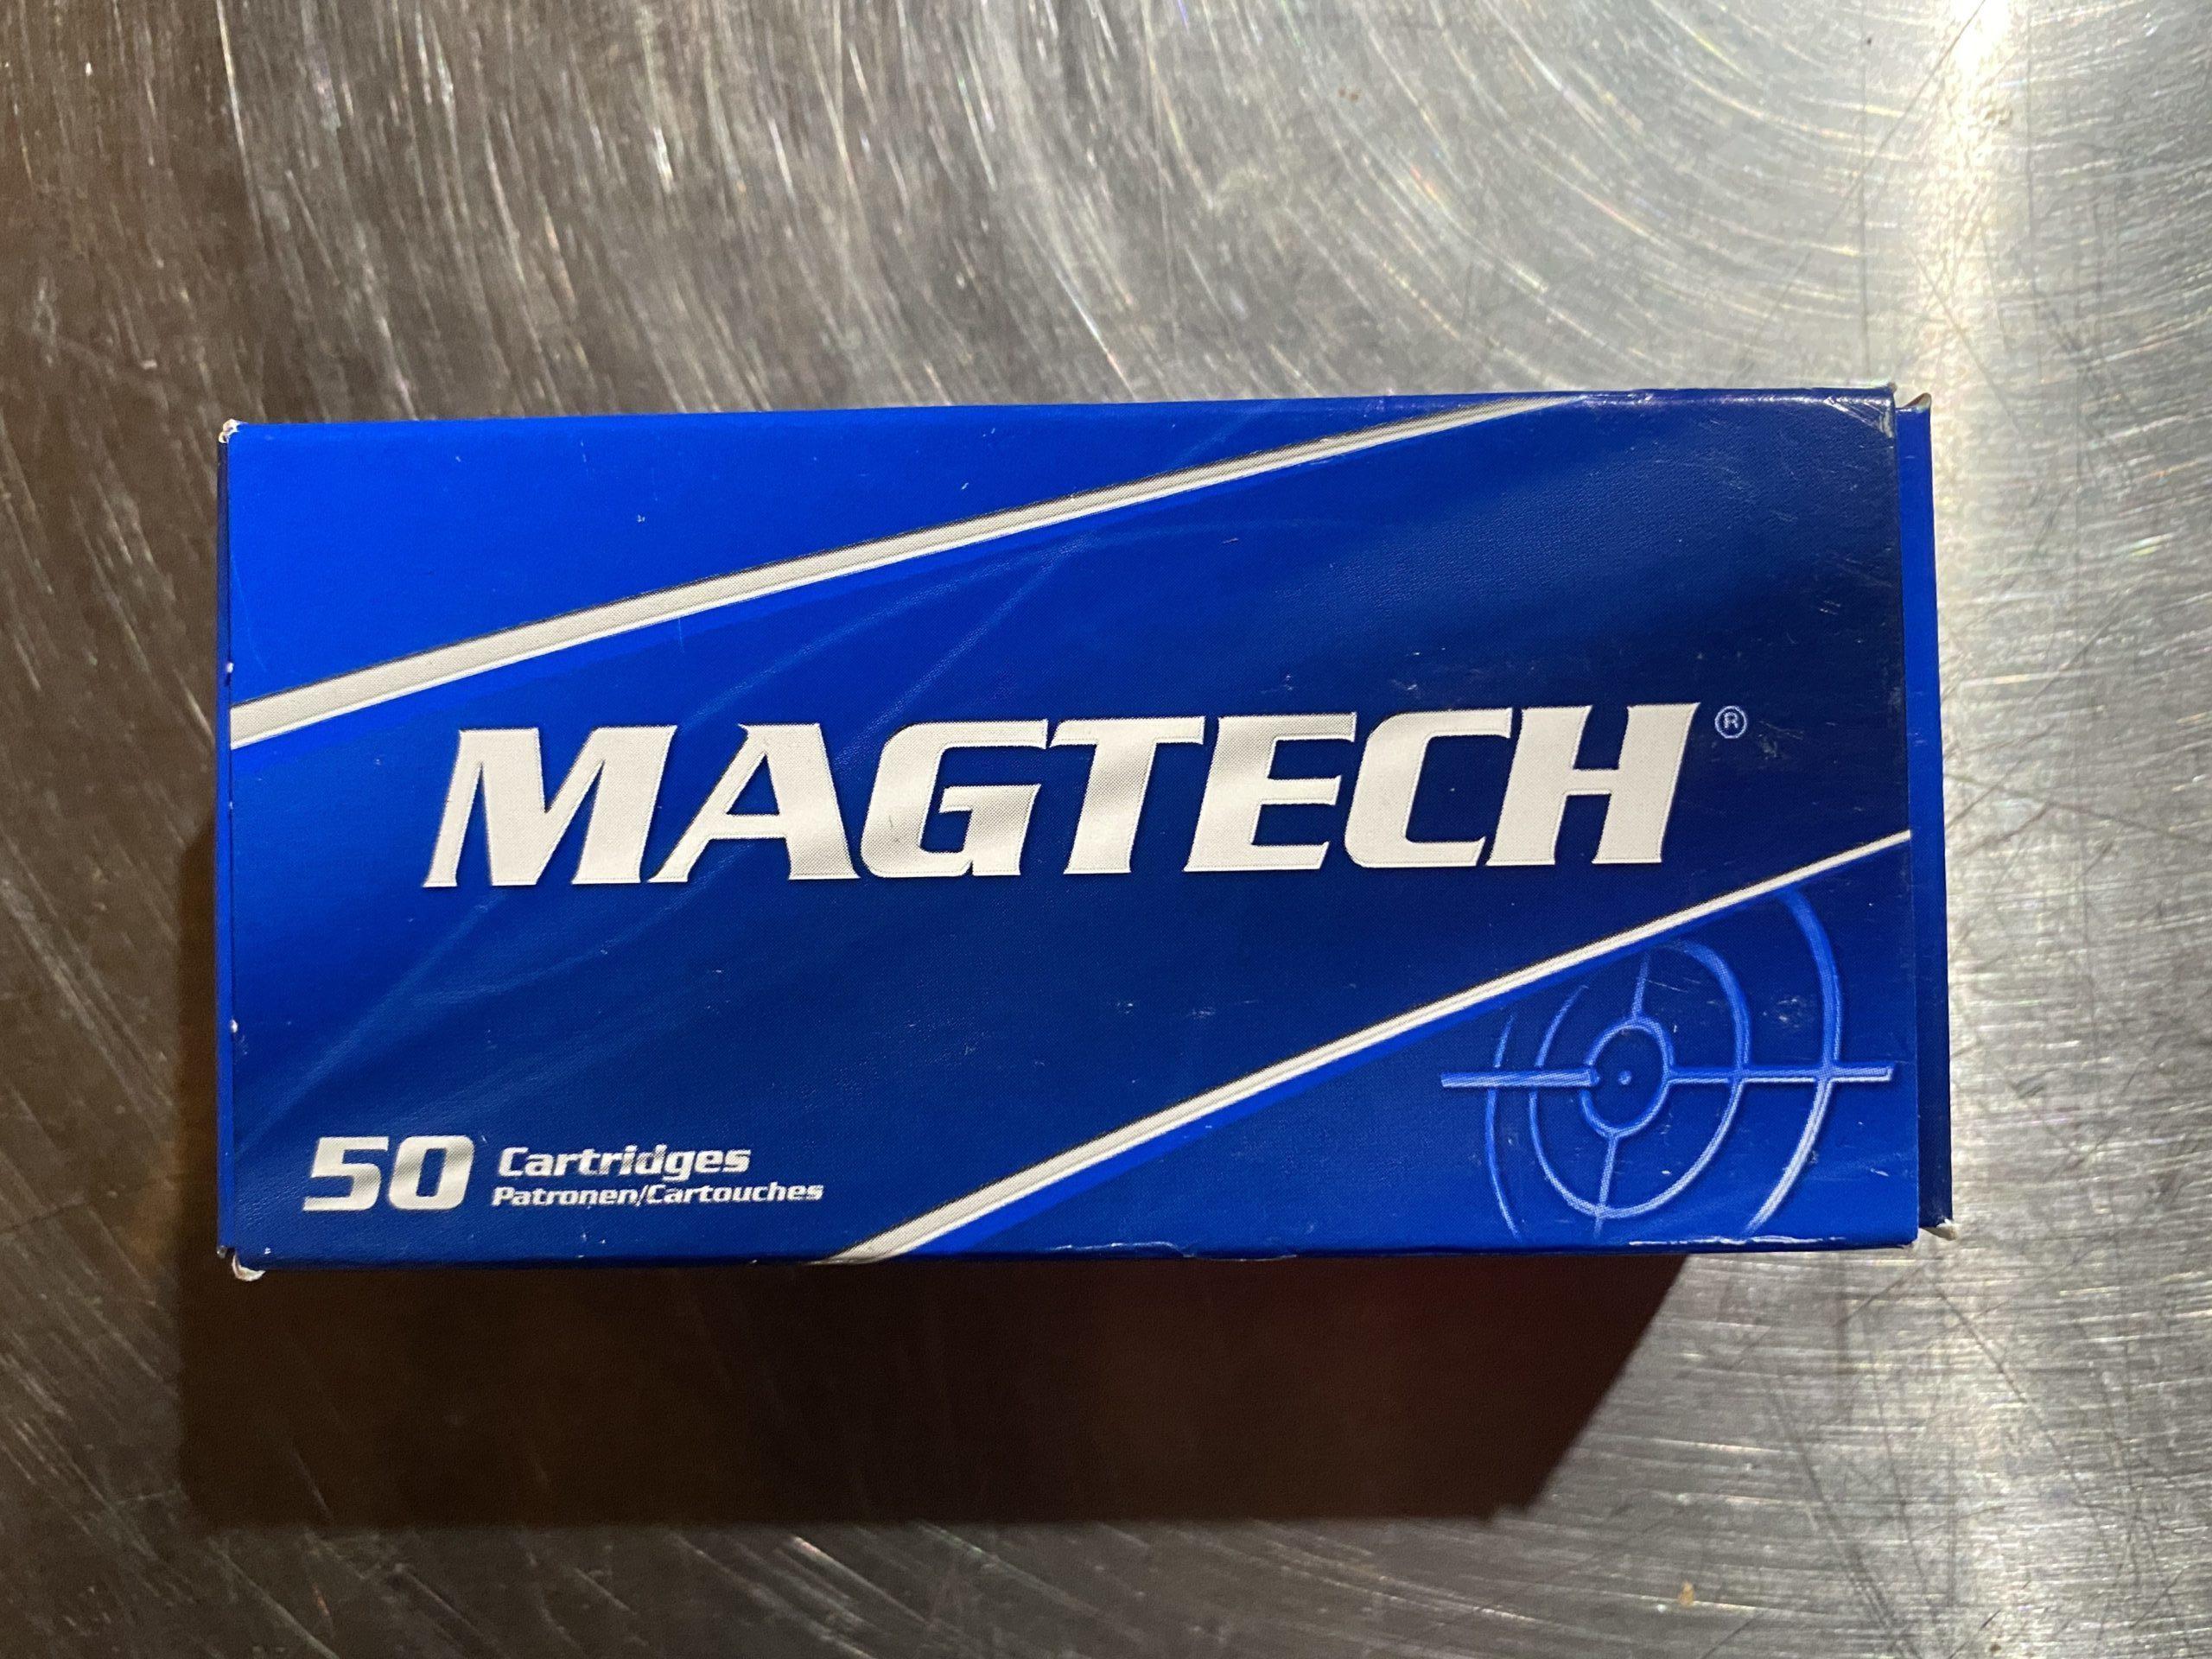 Magtech 9MM Luger 124g FMJ 50 rounds